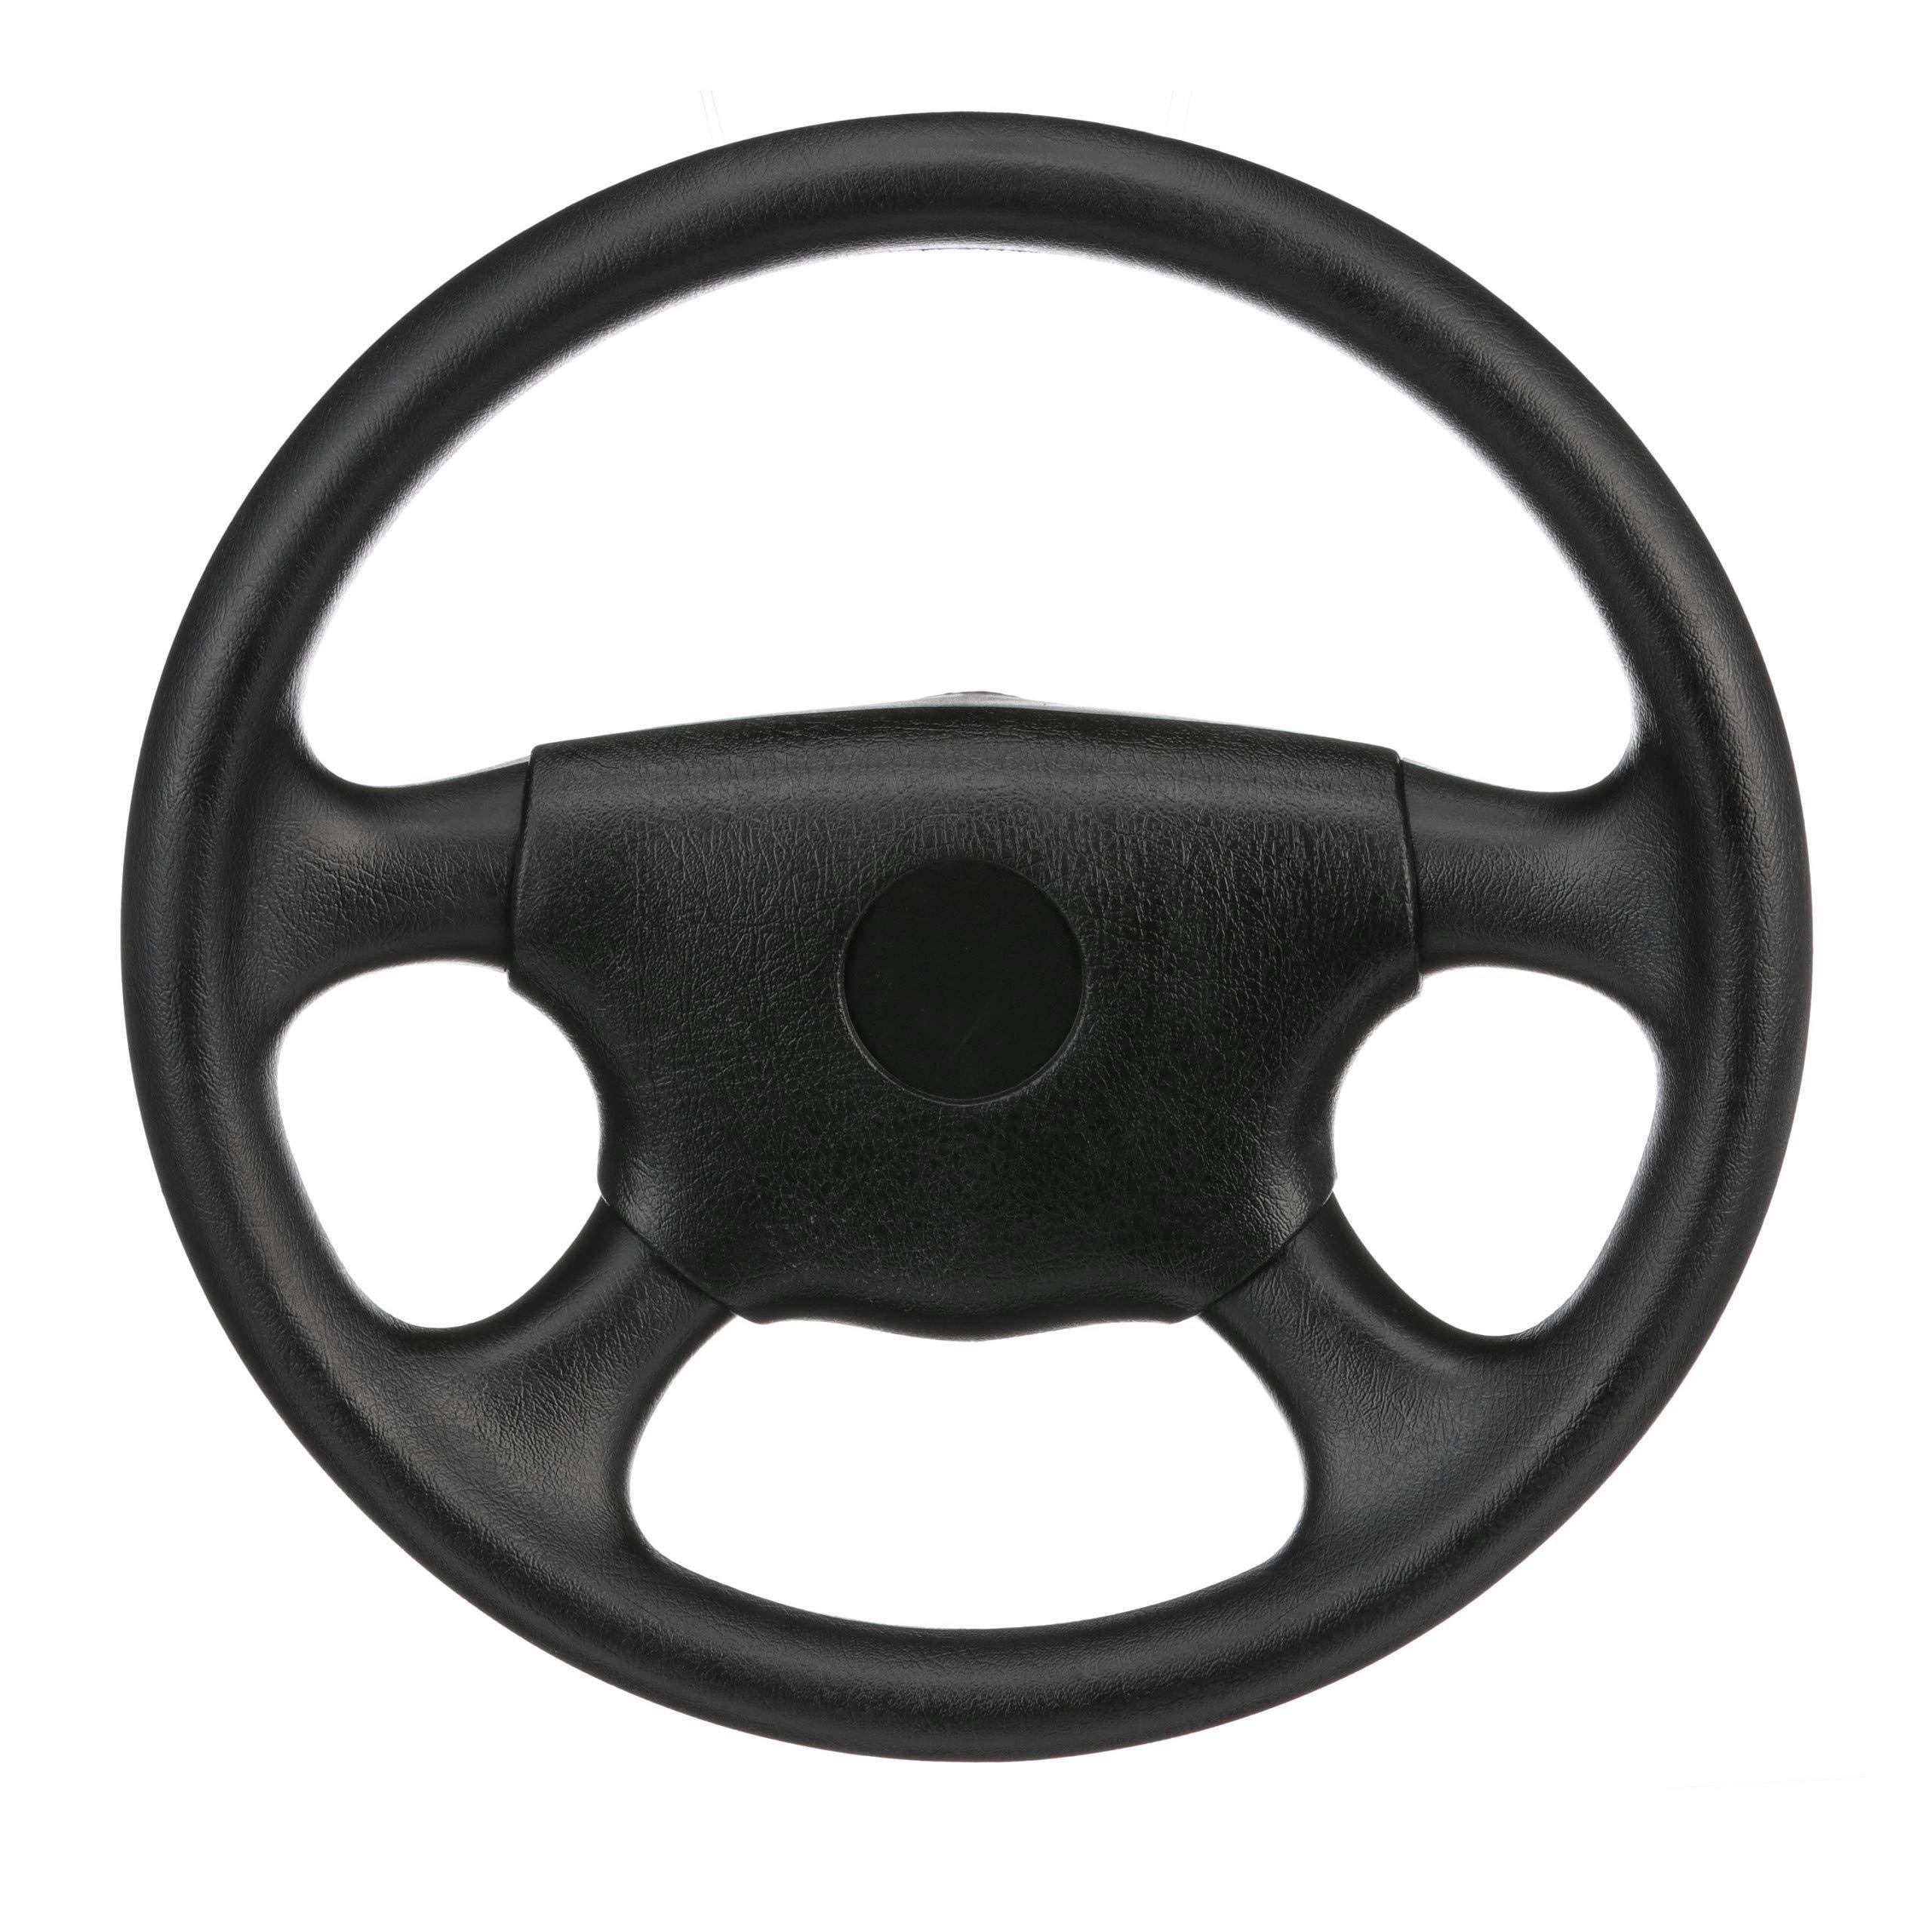 SeaChoice 28510 Universal UV-Resistant 4-Spoke Marine Boat Leather Steering Wheel by SEACHOICE